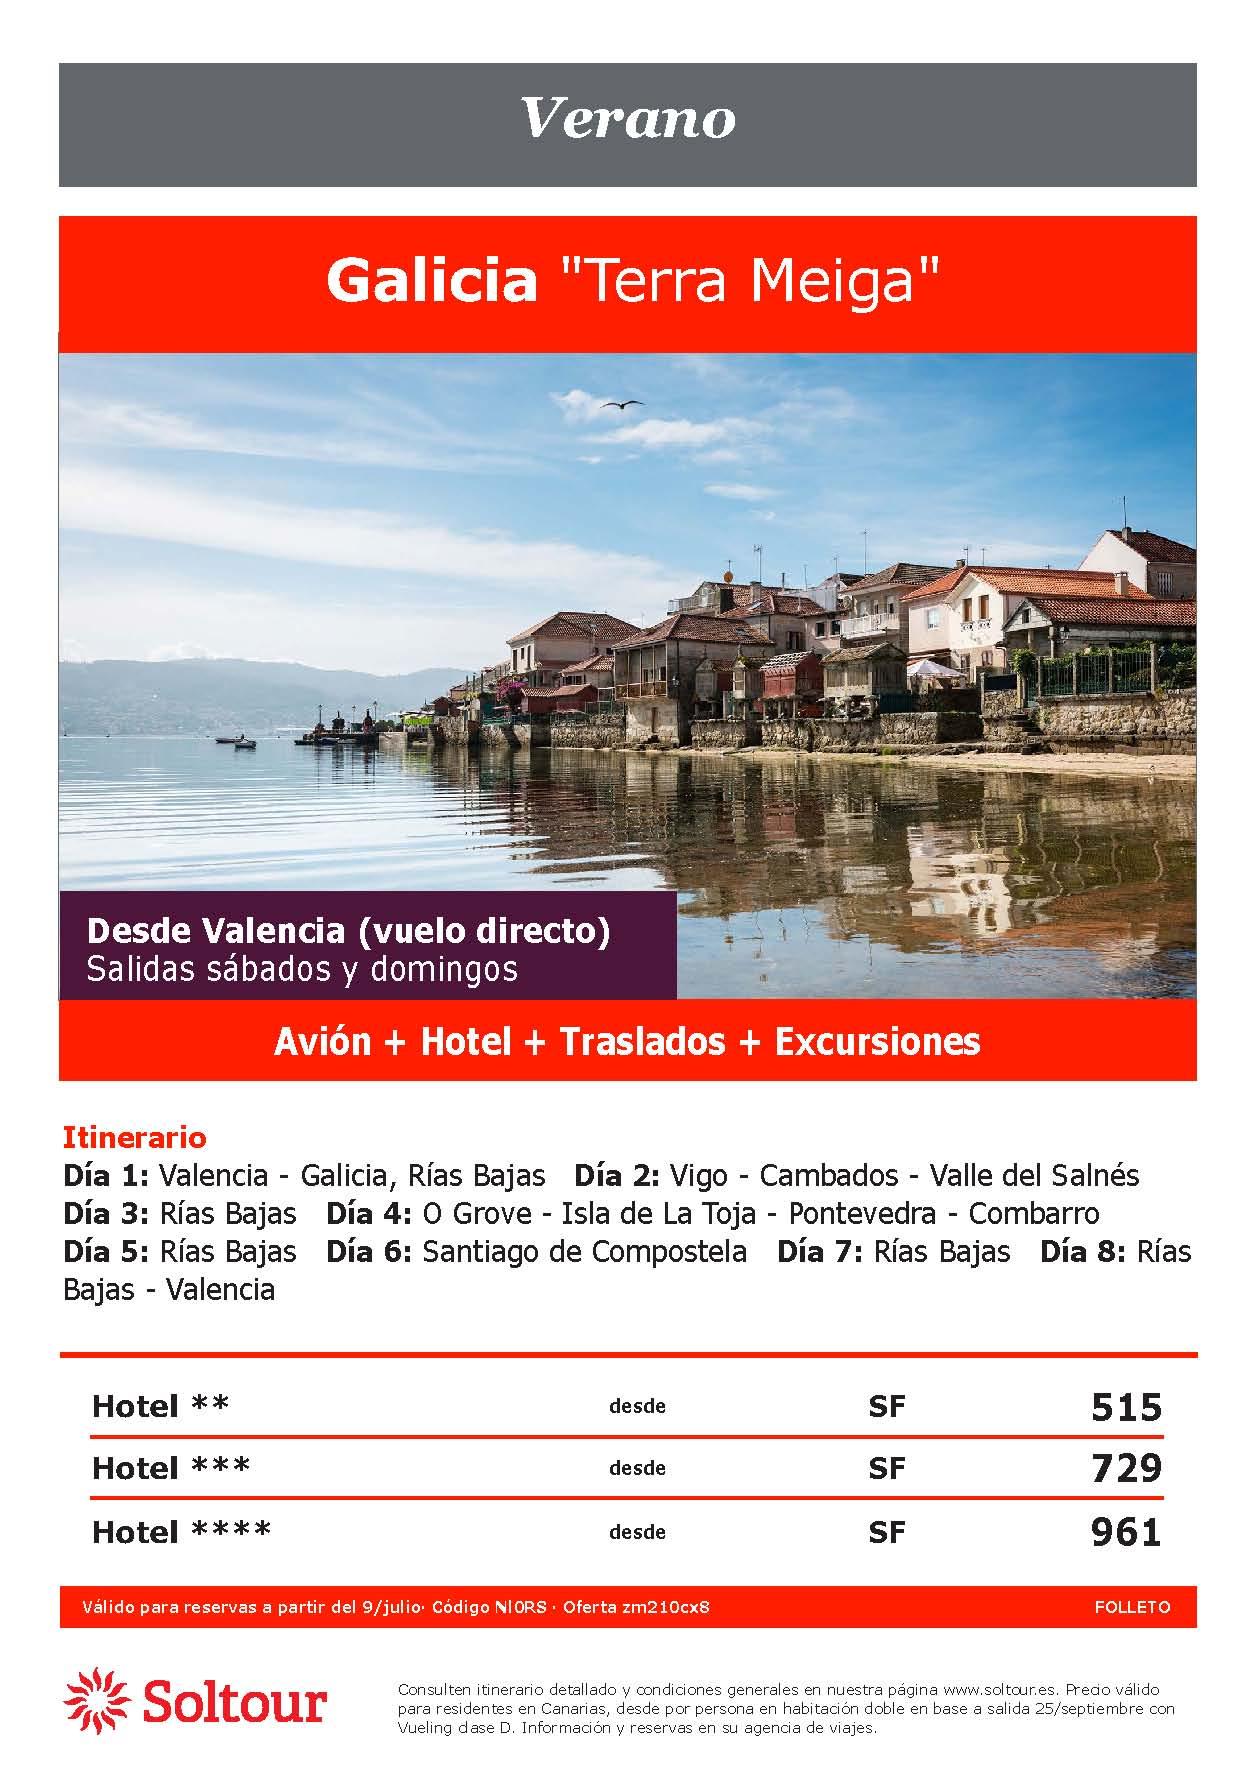 Oferta Soltour Ultima Hora Circuito por Galicia en avion desde Valencia Verano 2021